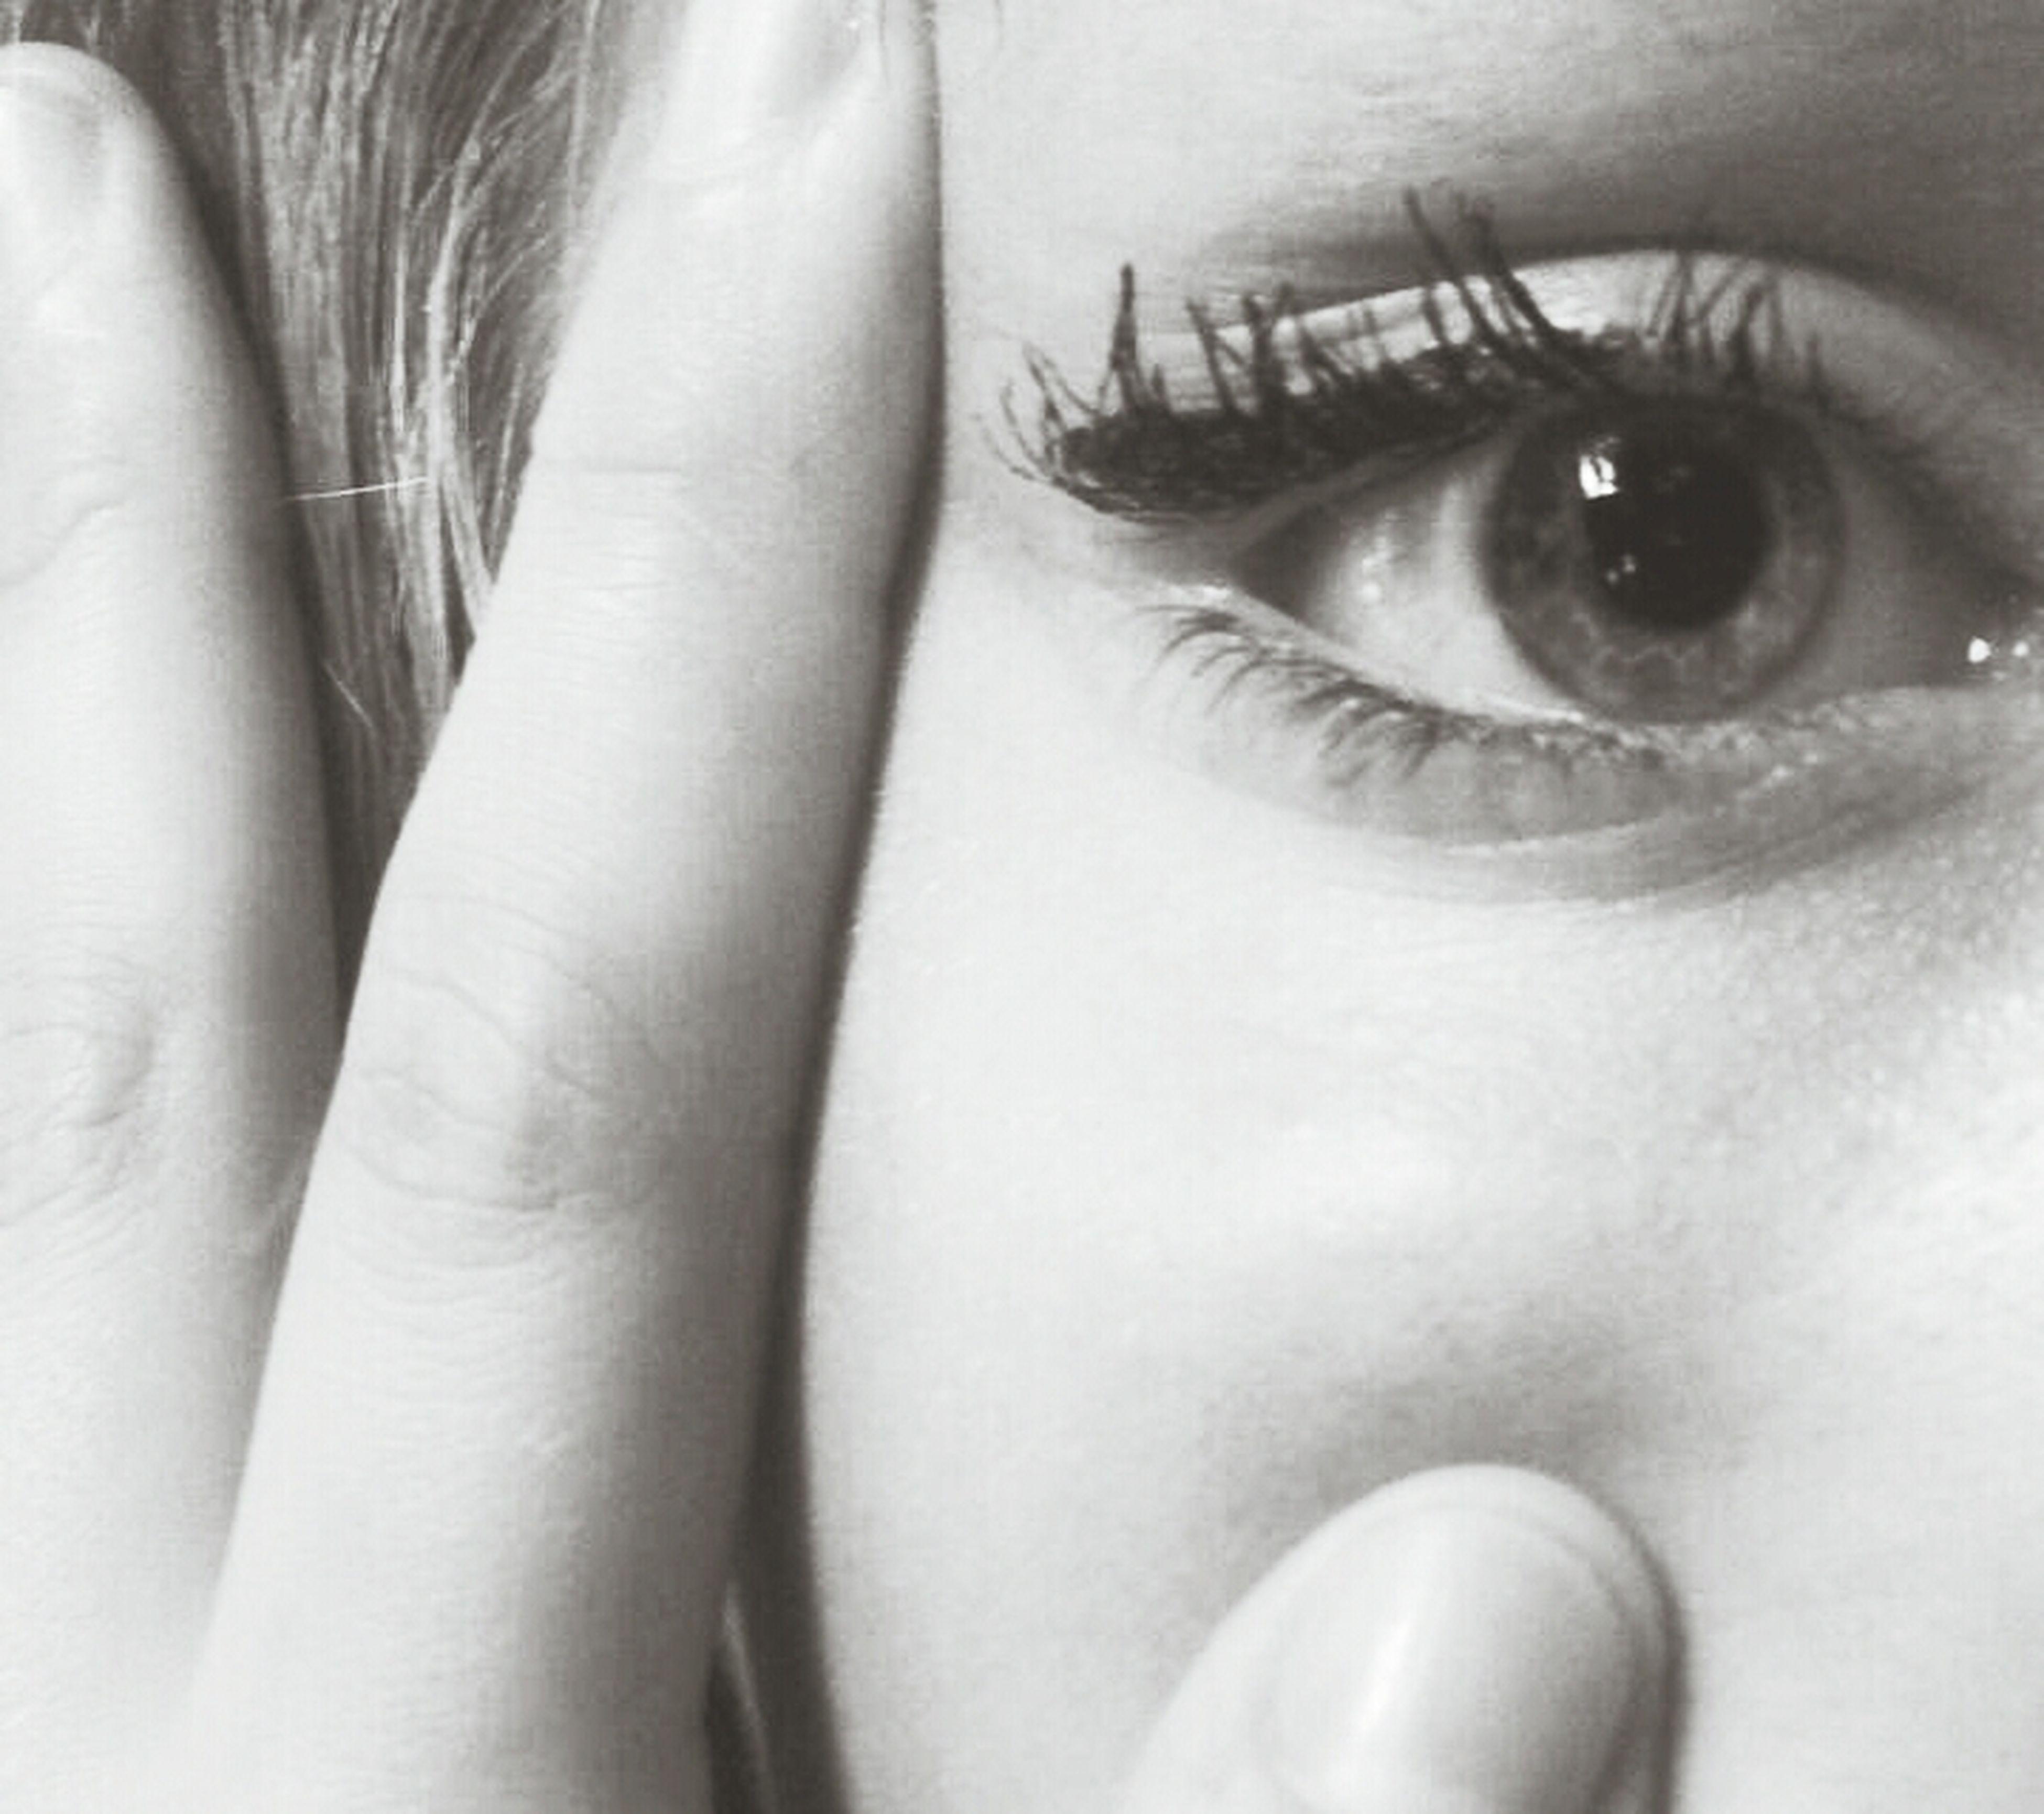 indoors, close-up, part of, human eye, lifestyles, person, human skin, human face, cropped, eyesight, young adult, eyelash, headshot, leisure activity, human finger, looking at camera